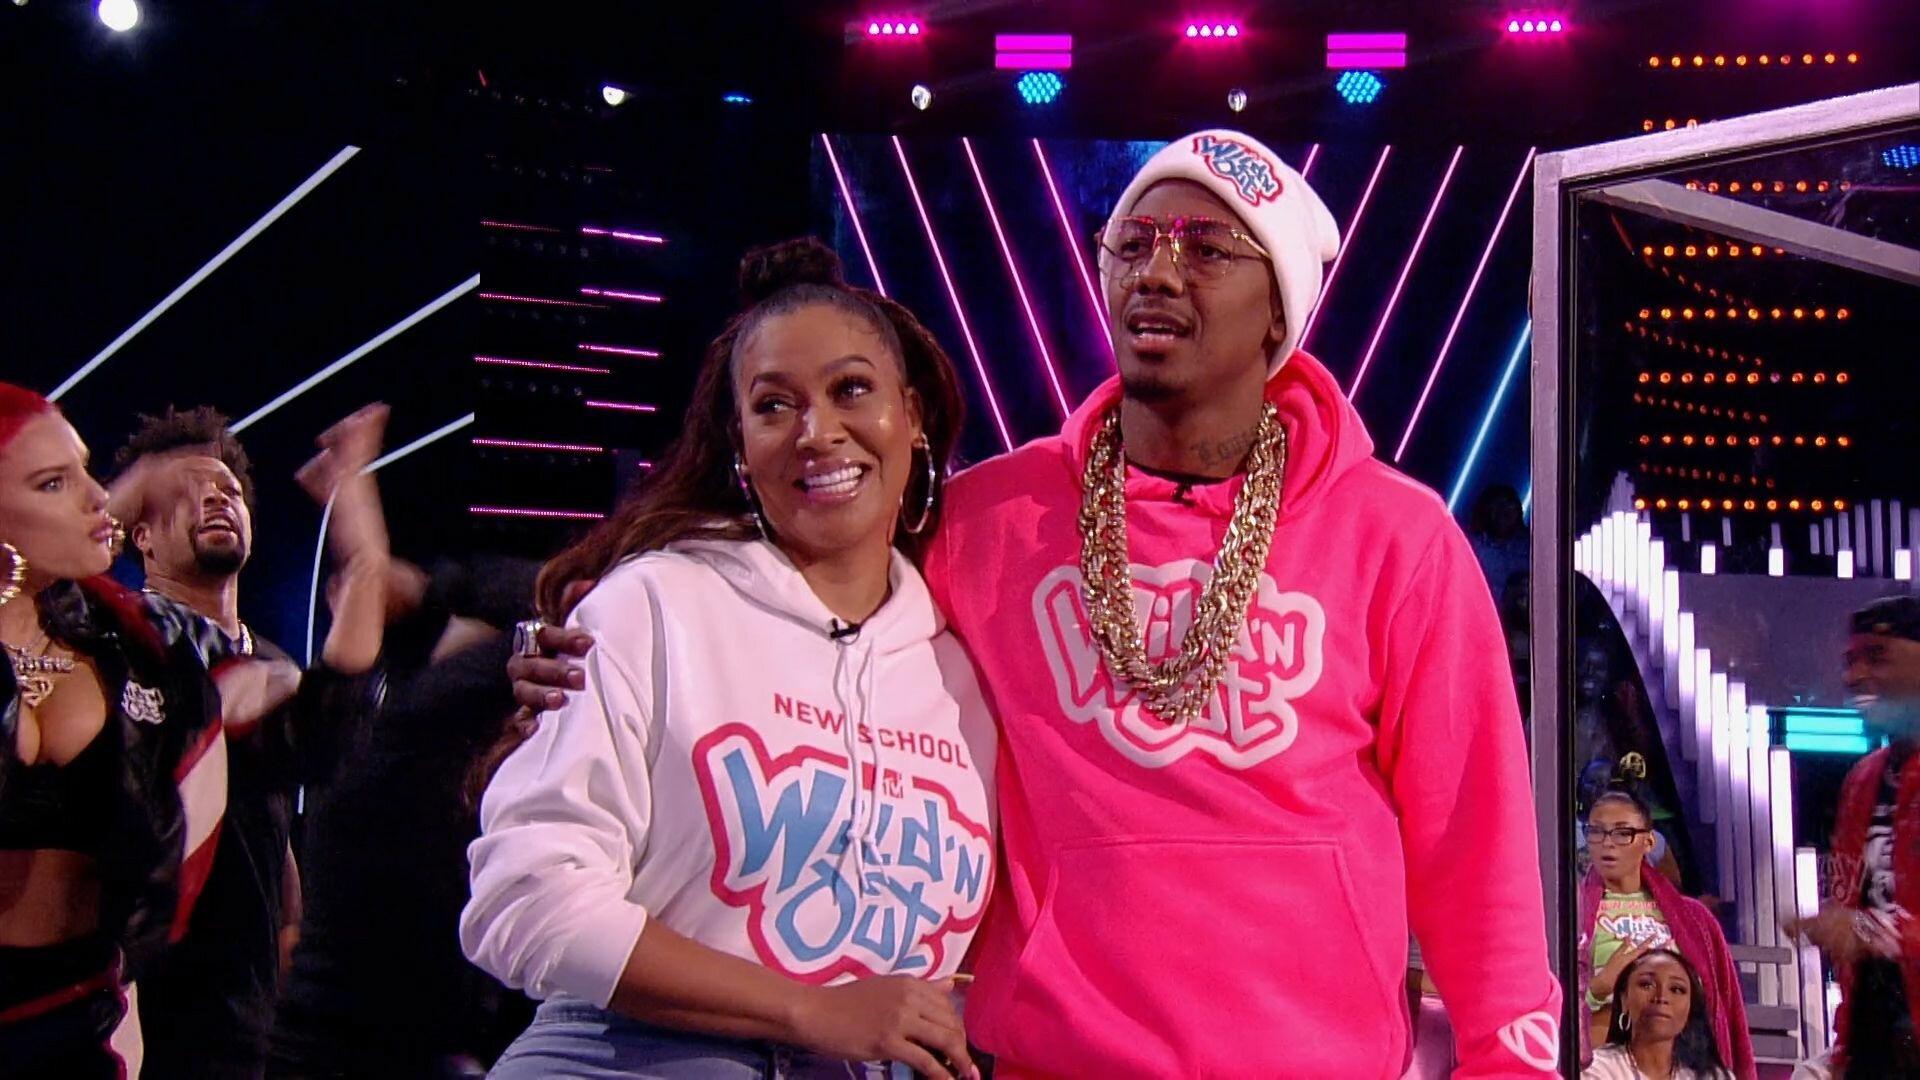 Wild 'N Out — s15e06 — La La Anthony, Lil Keed & Karlae